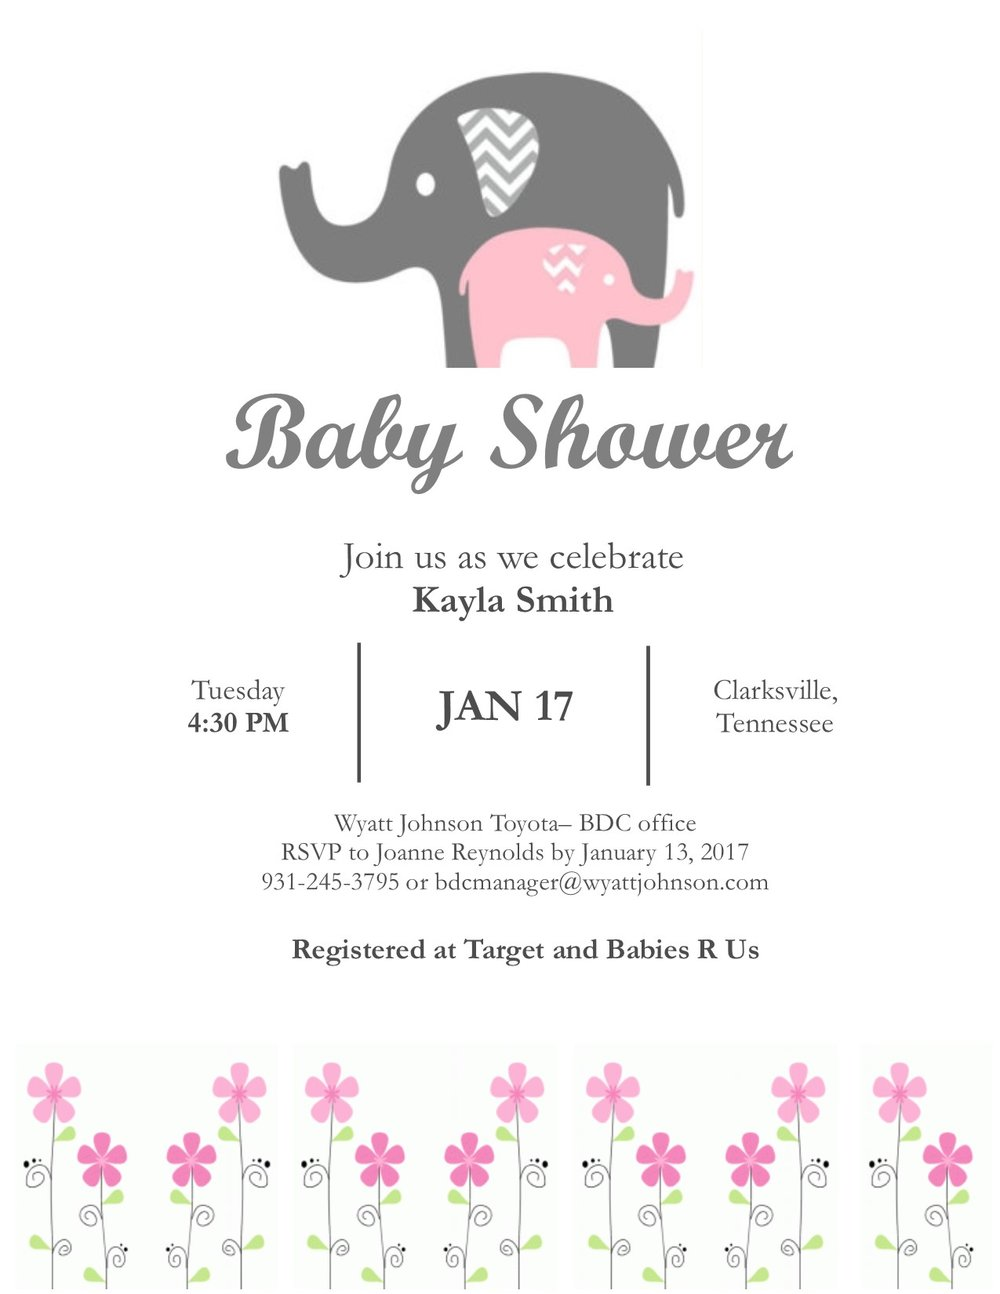 kayla's baby shower.jpg